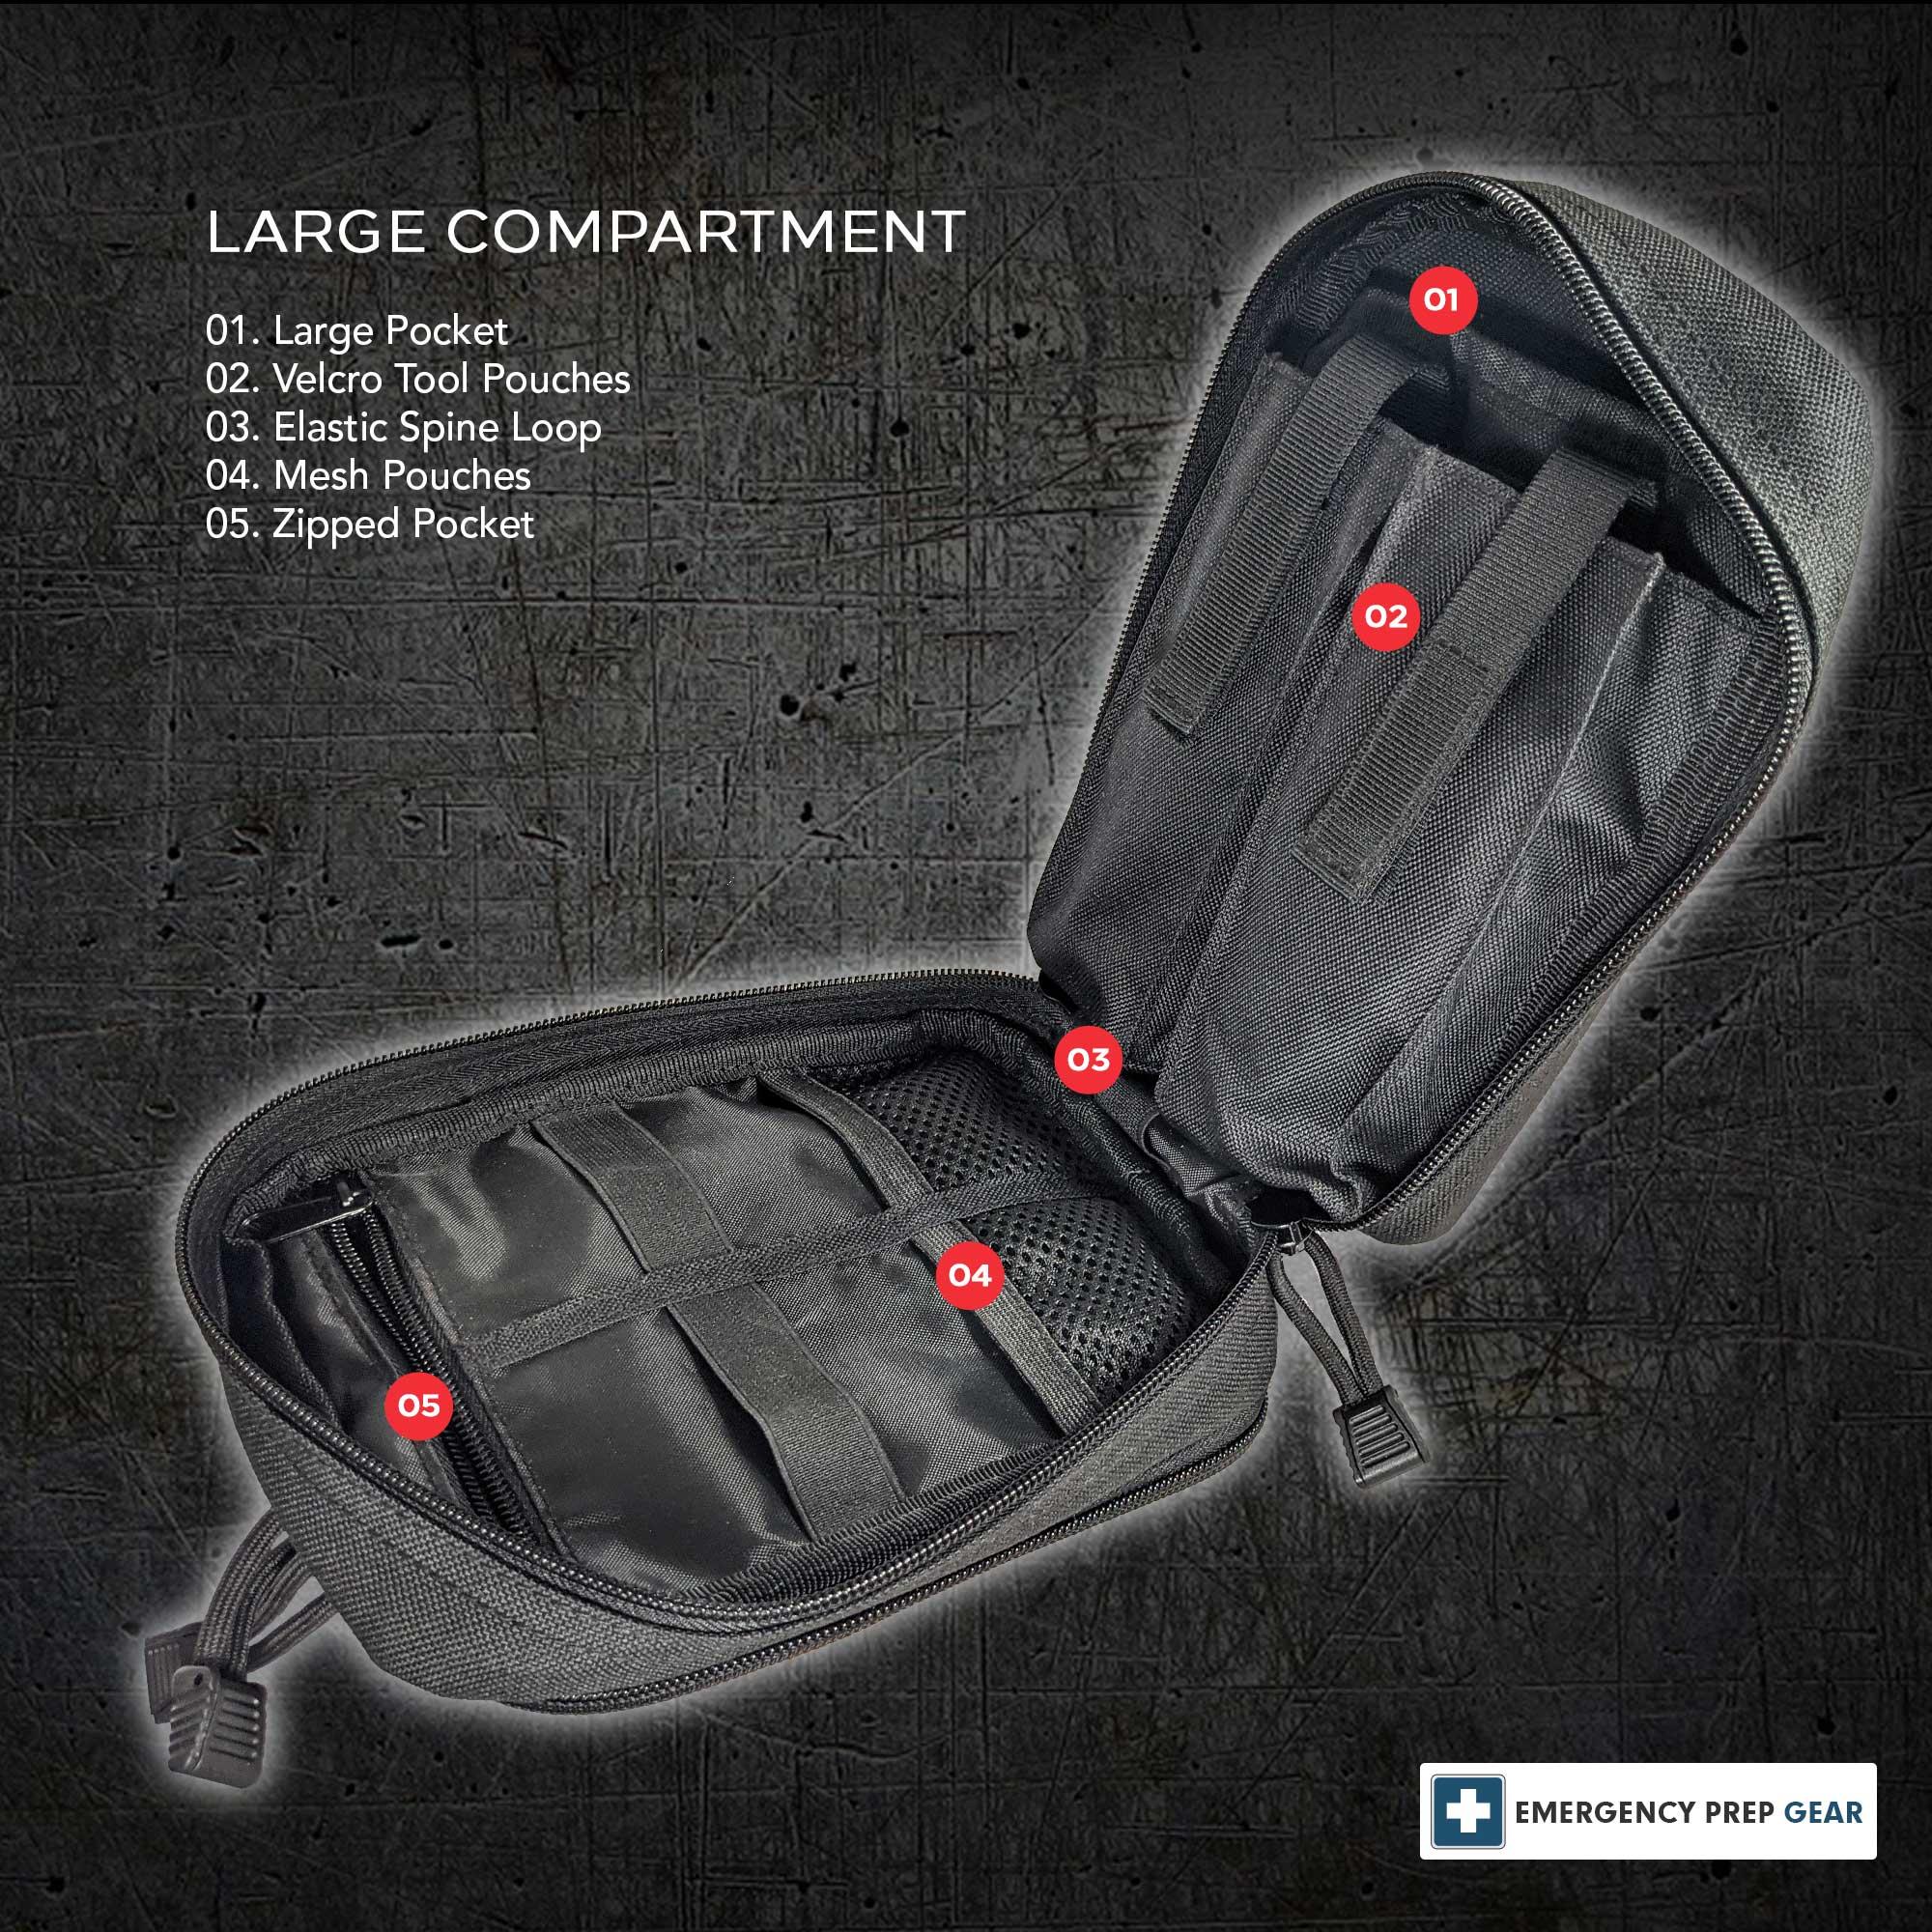 21 10 08 16 01 05 original b09dr49ctv epg gear compact black compartment1